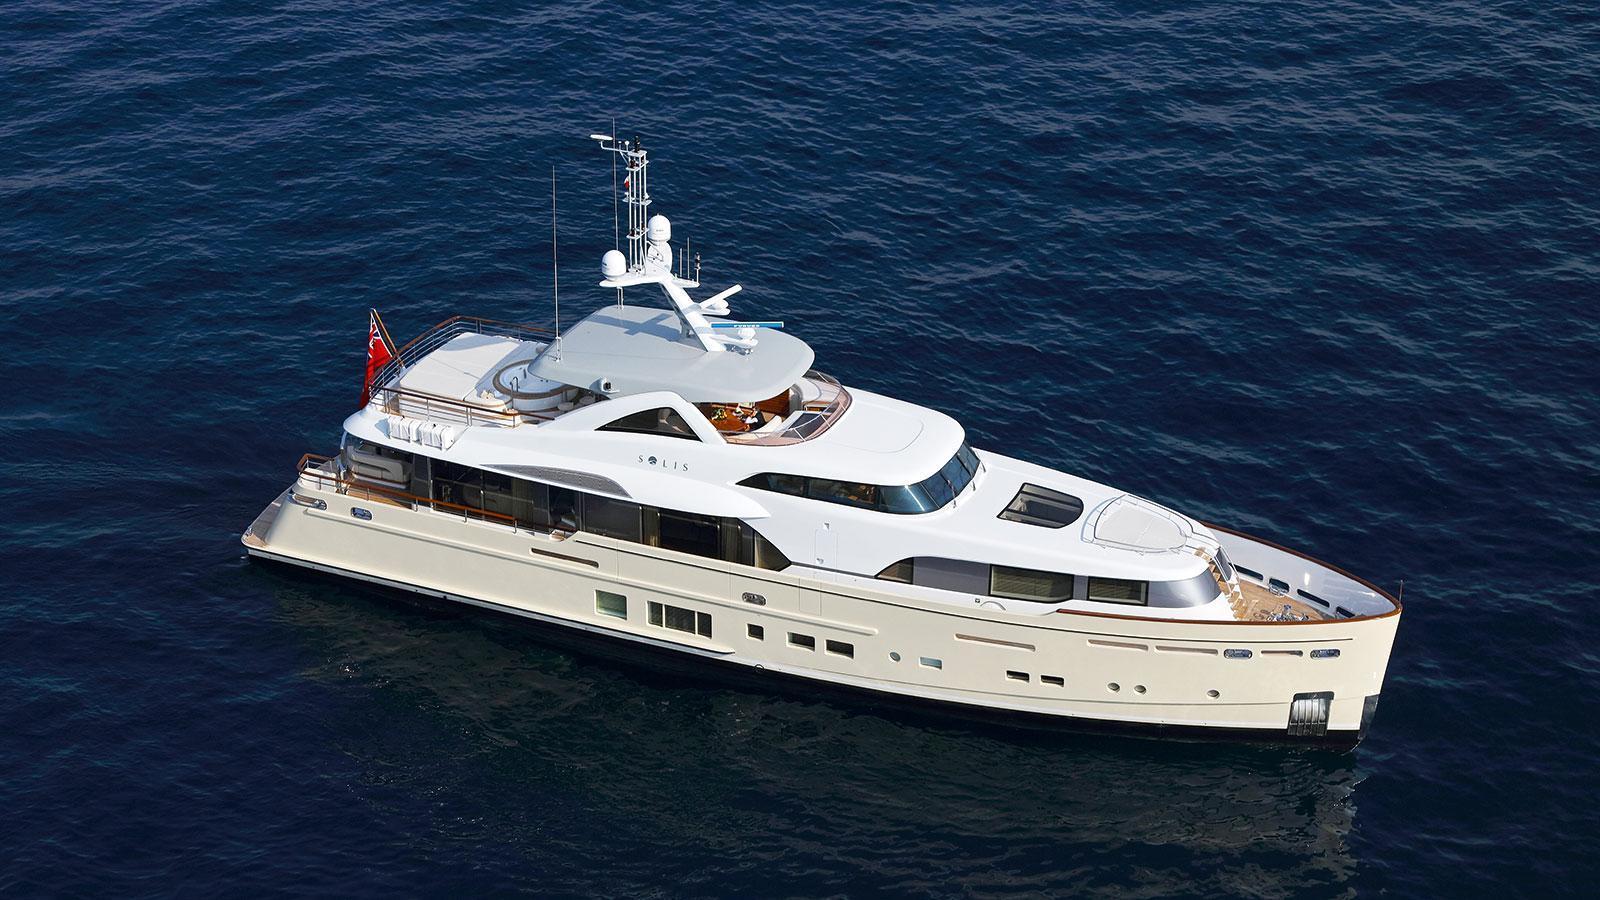 solis-motor-yacht-mulder-2015-34m-aerial-half-profile